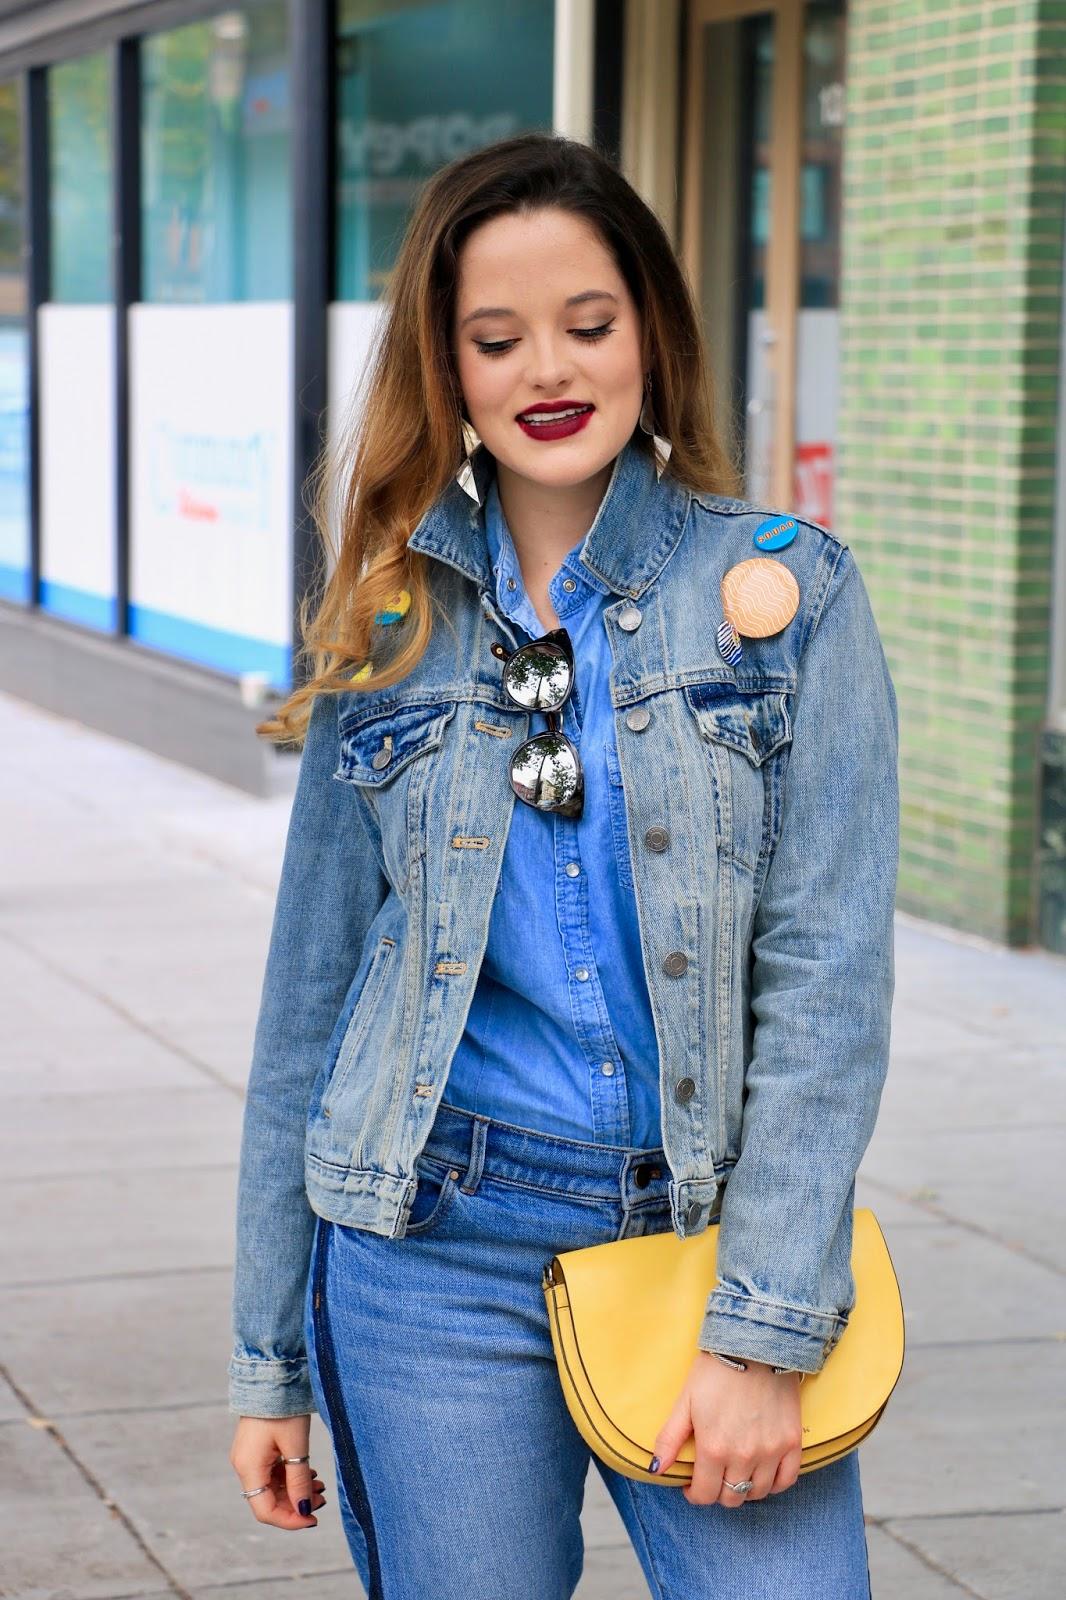 Nyc fashion blogger Kathleen Harper of Kat's Fashion Fix